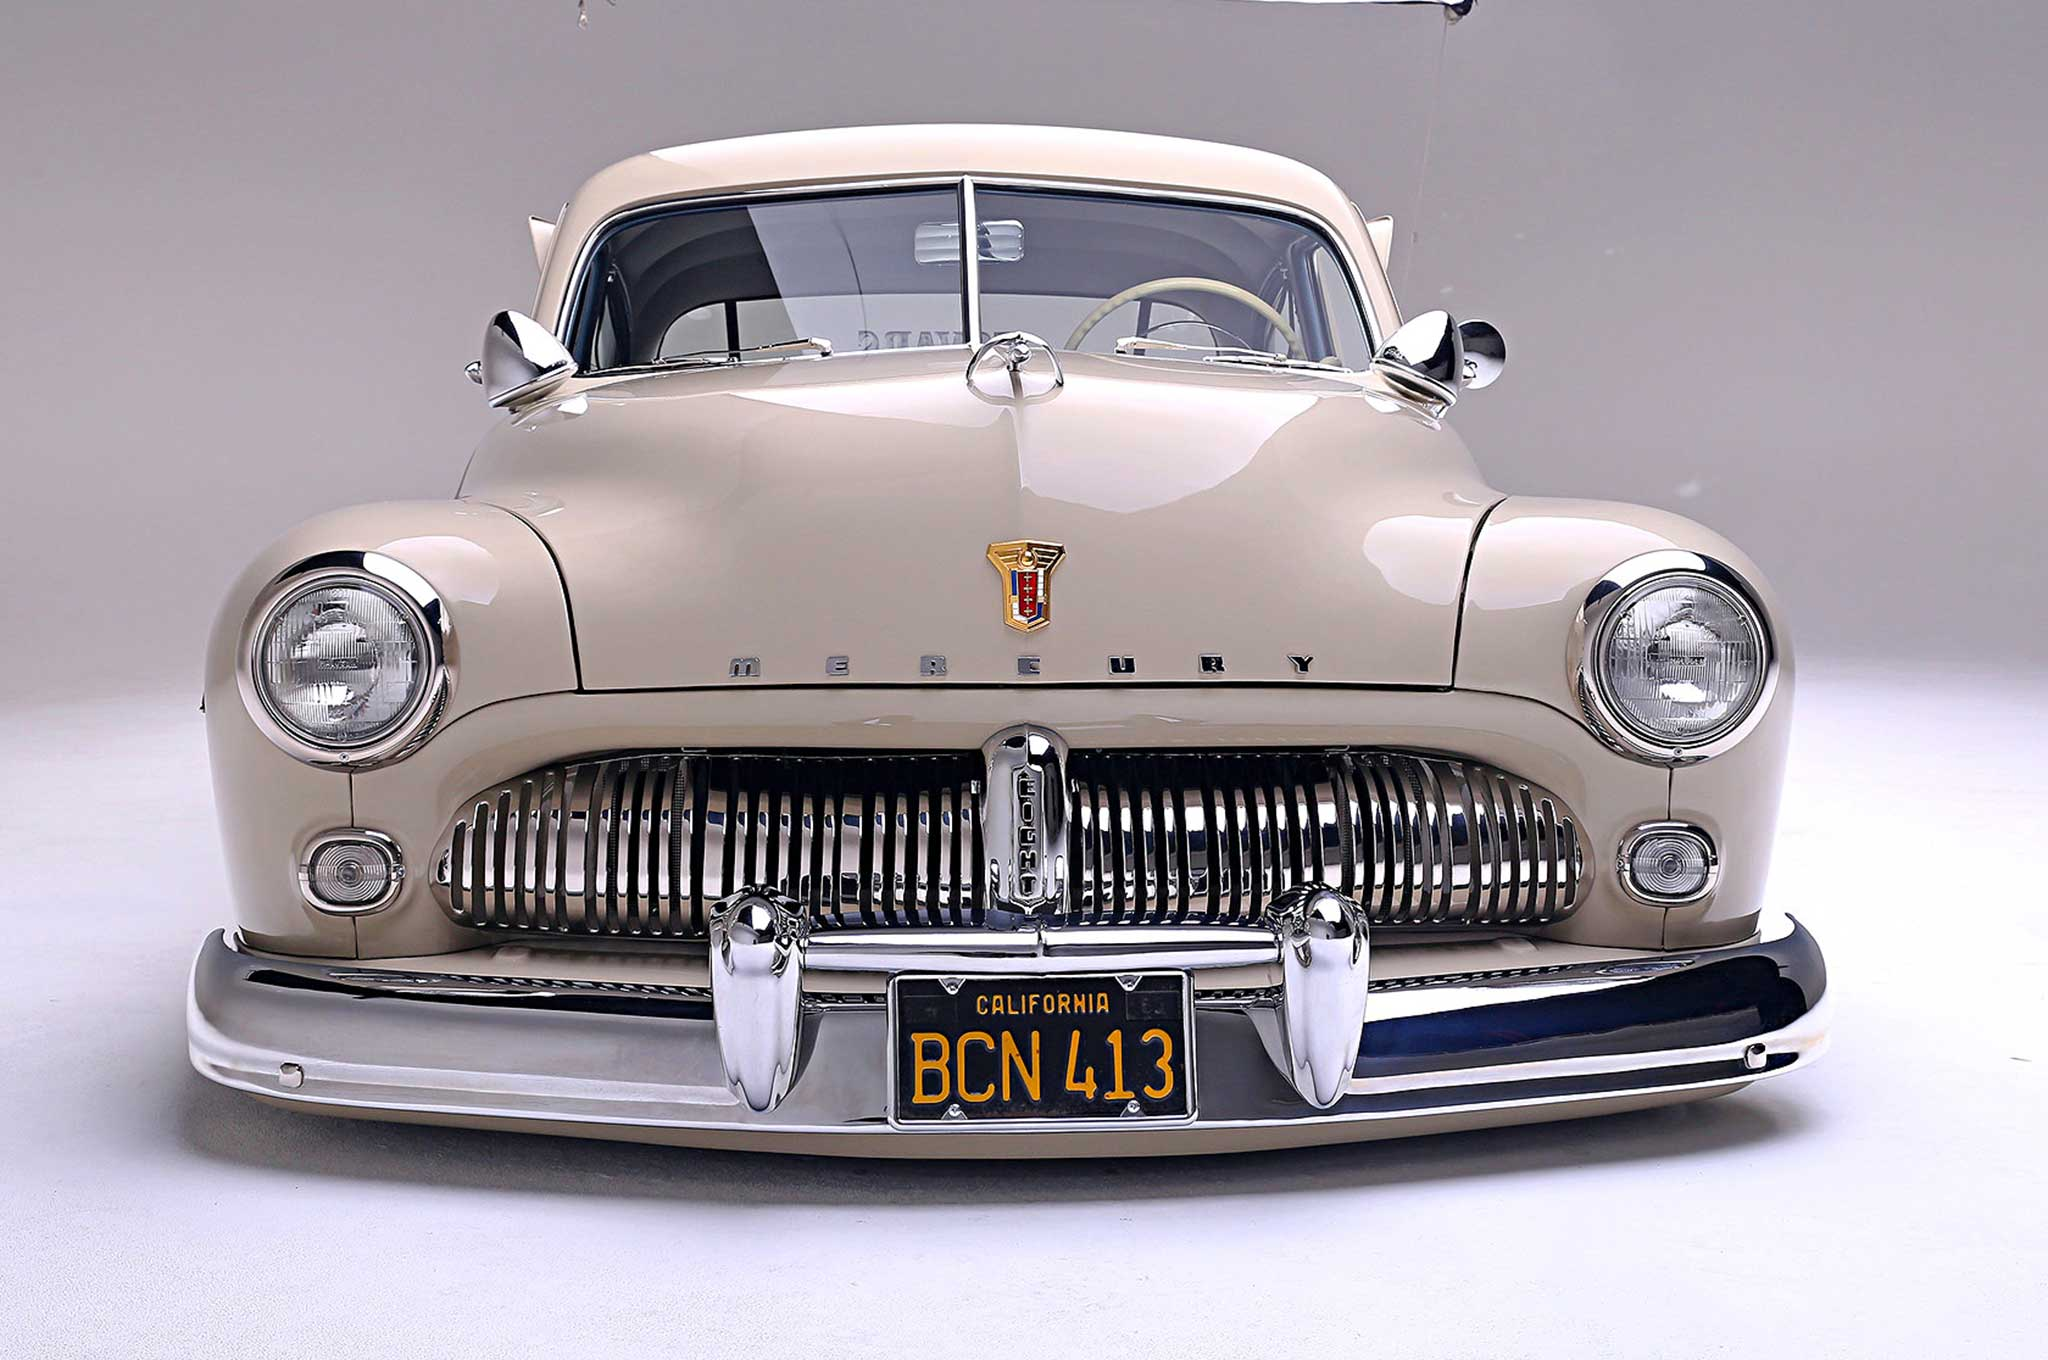 1949 Mercury Eight Tovar S Merc